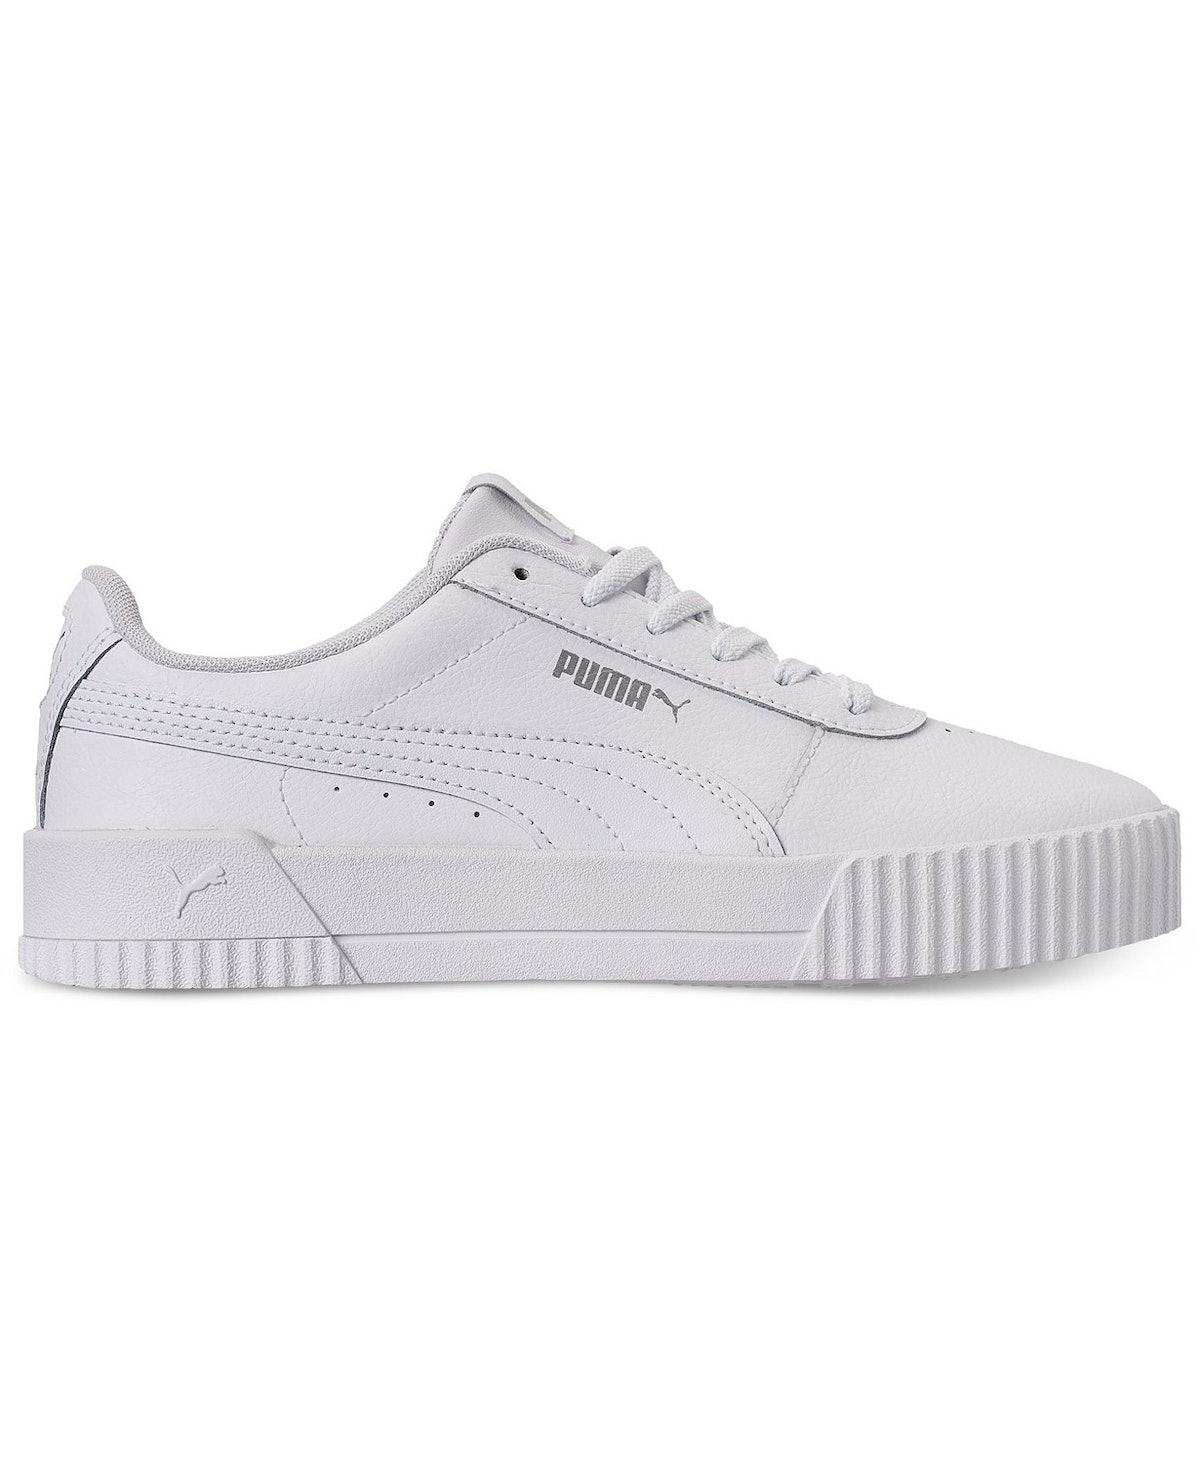 Puma Women's Carina Leather Casual Sneakers